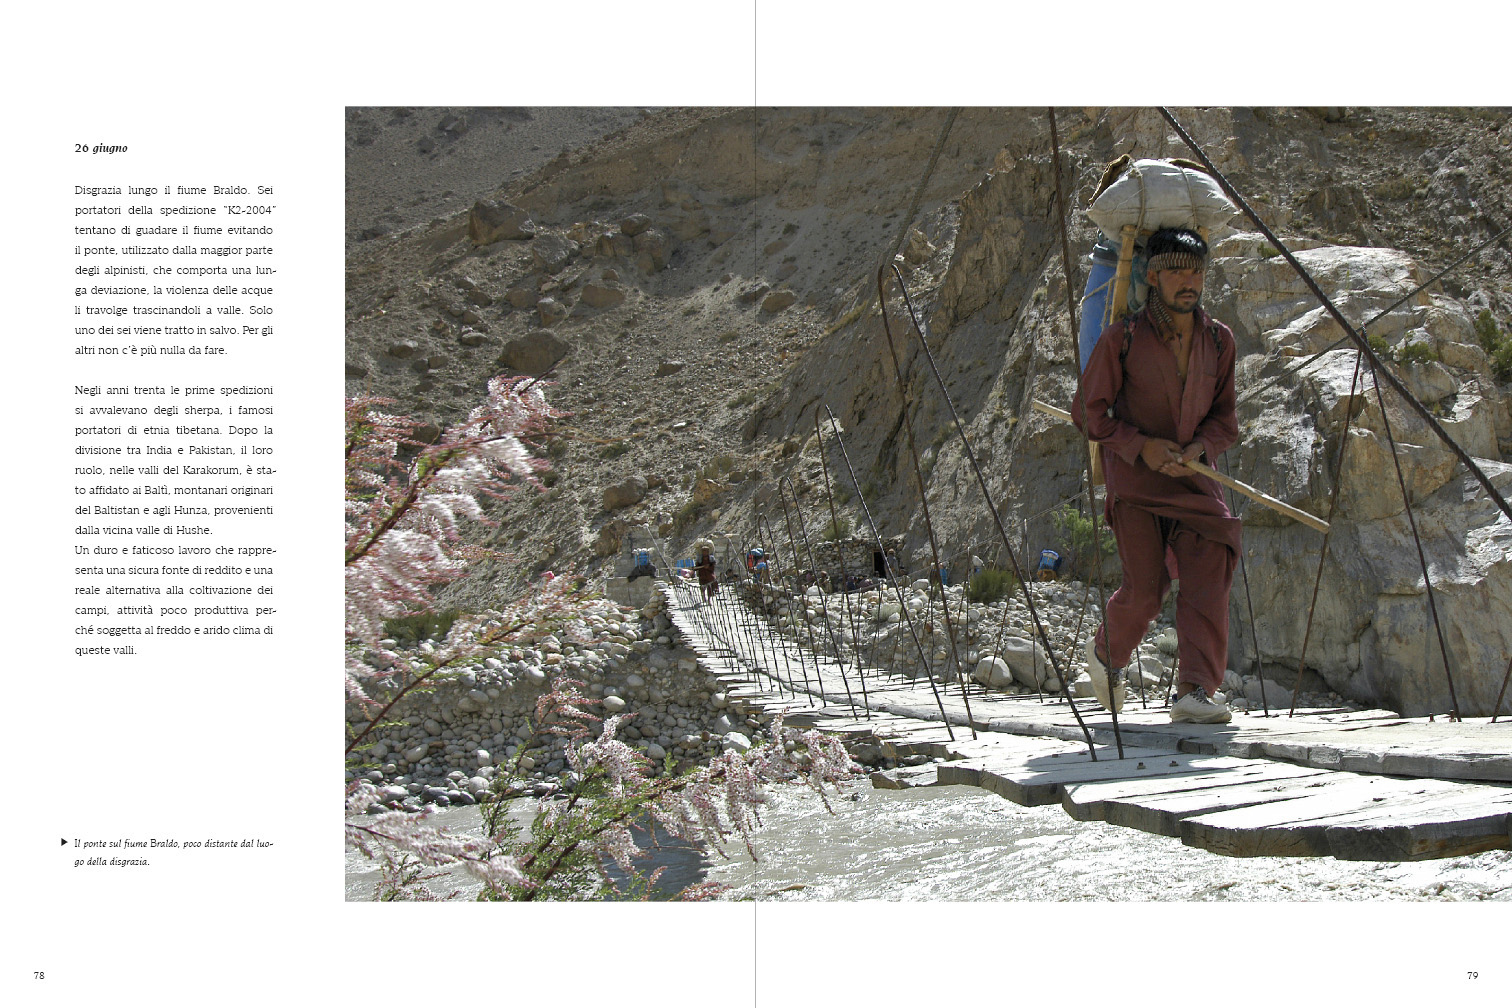 K2 EXPEDITION 1954-2004 Giuseppe Ghedina Fotografo - 041.jpg